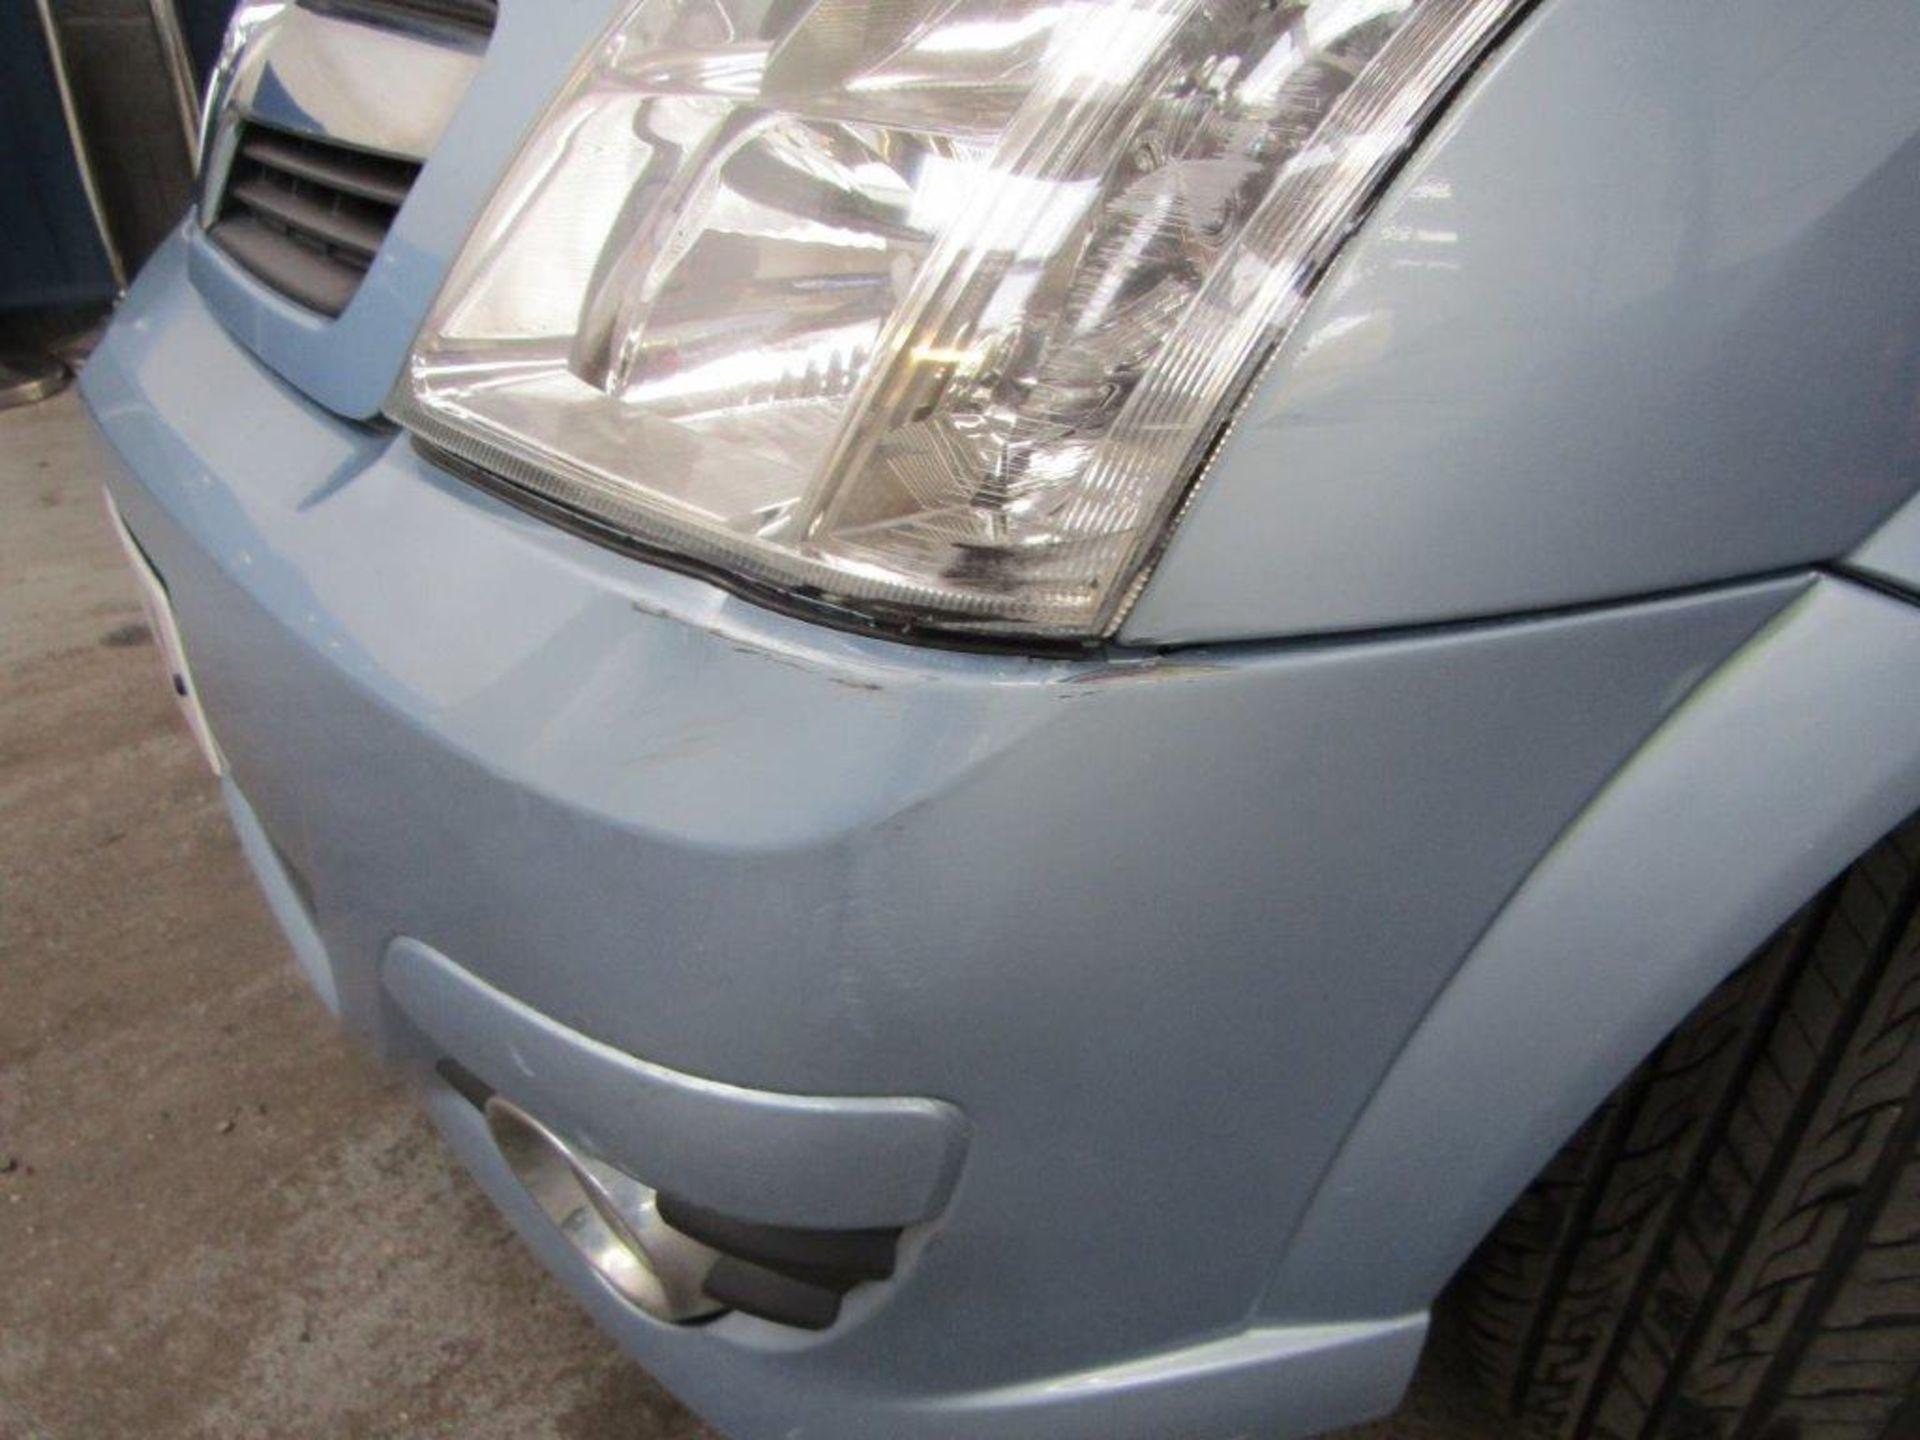 58 08 Vauxhall Meriva Design - Image 12 of 25